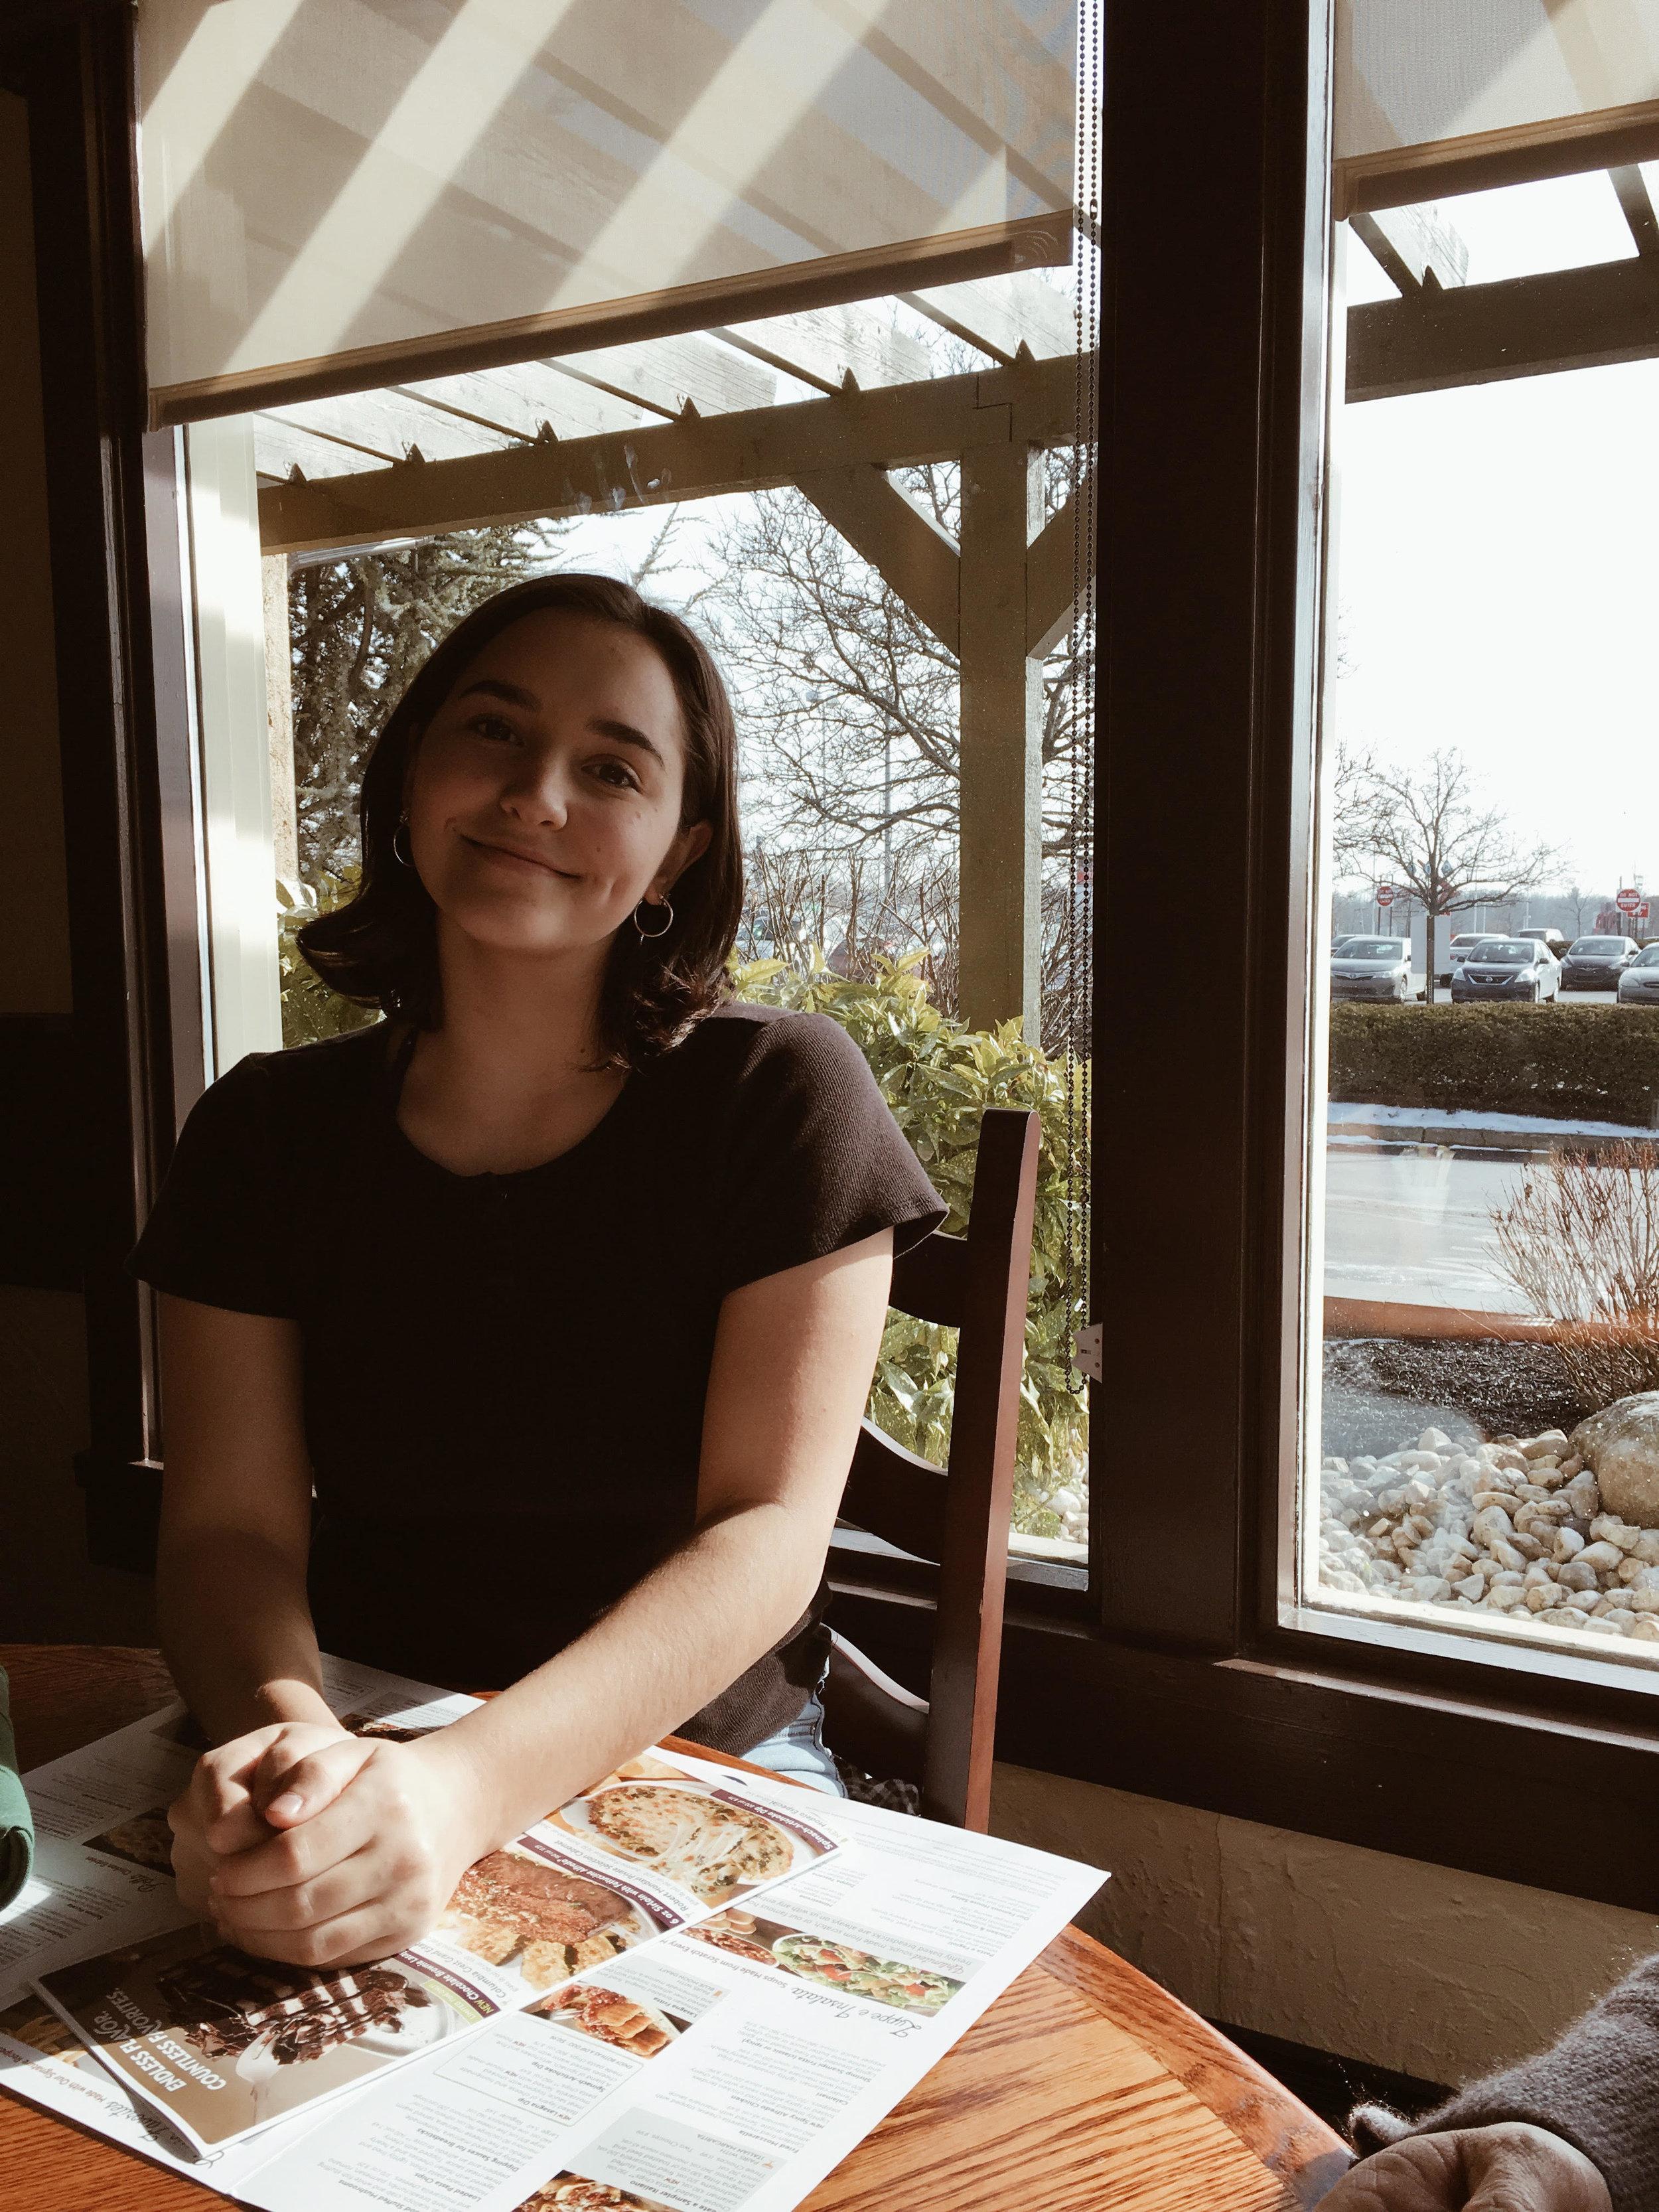 Carlson now, who considers herself in recovery. | DAKODA CARLSON / REFINE MAGAZINE